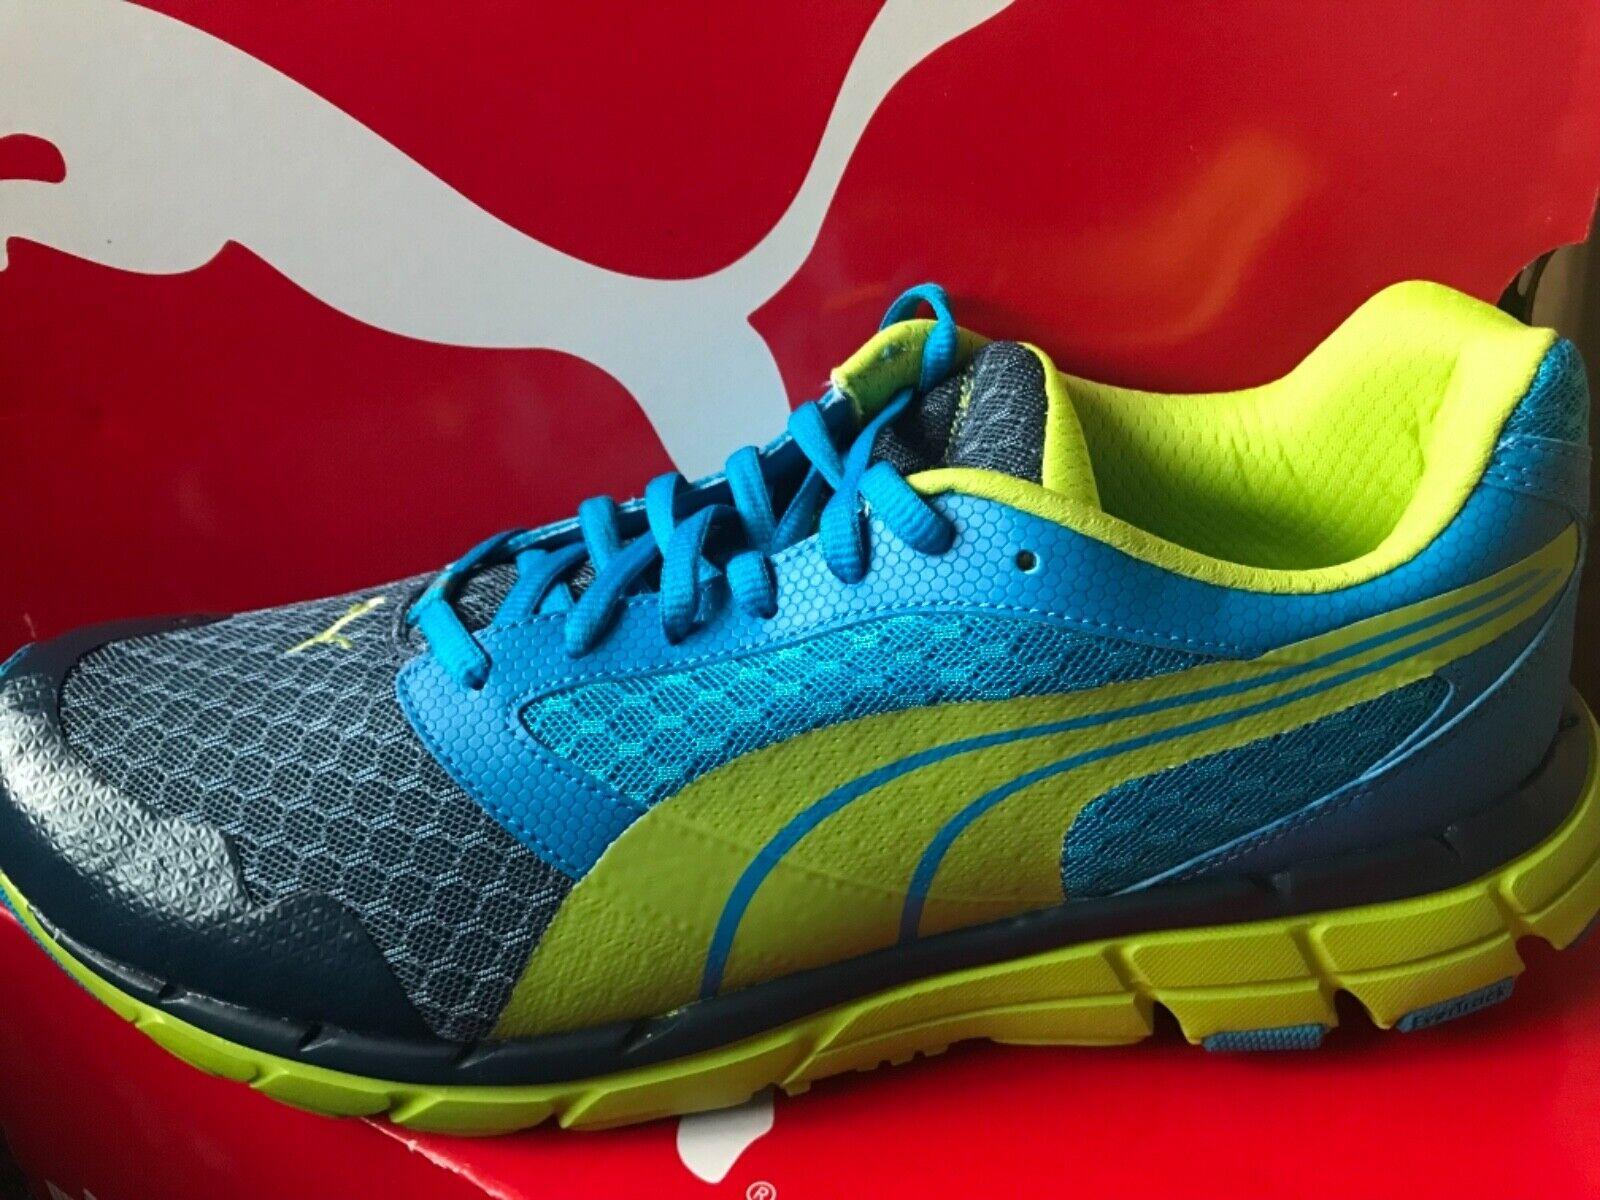 Men's Puma Poseidon Majolica bluee Green Running shoes Trainers BNIB